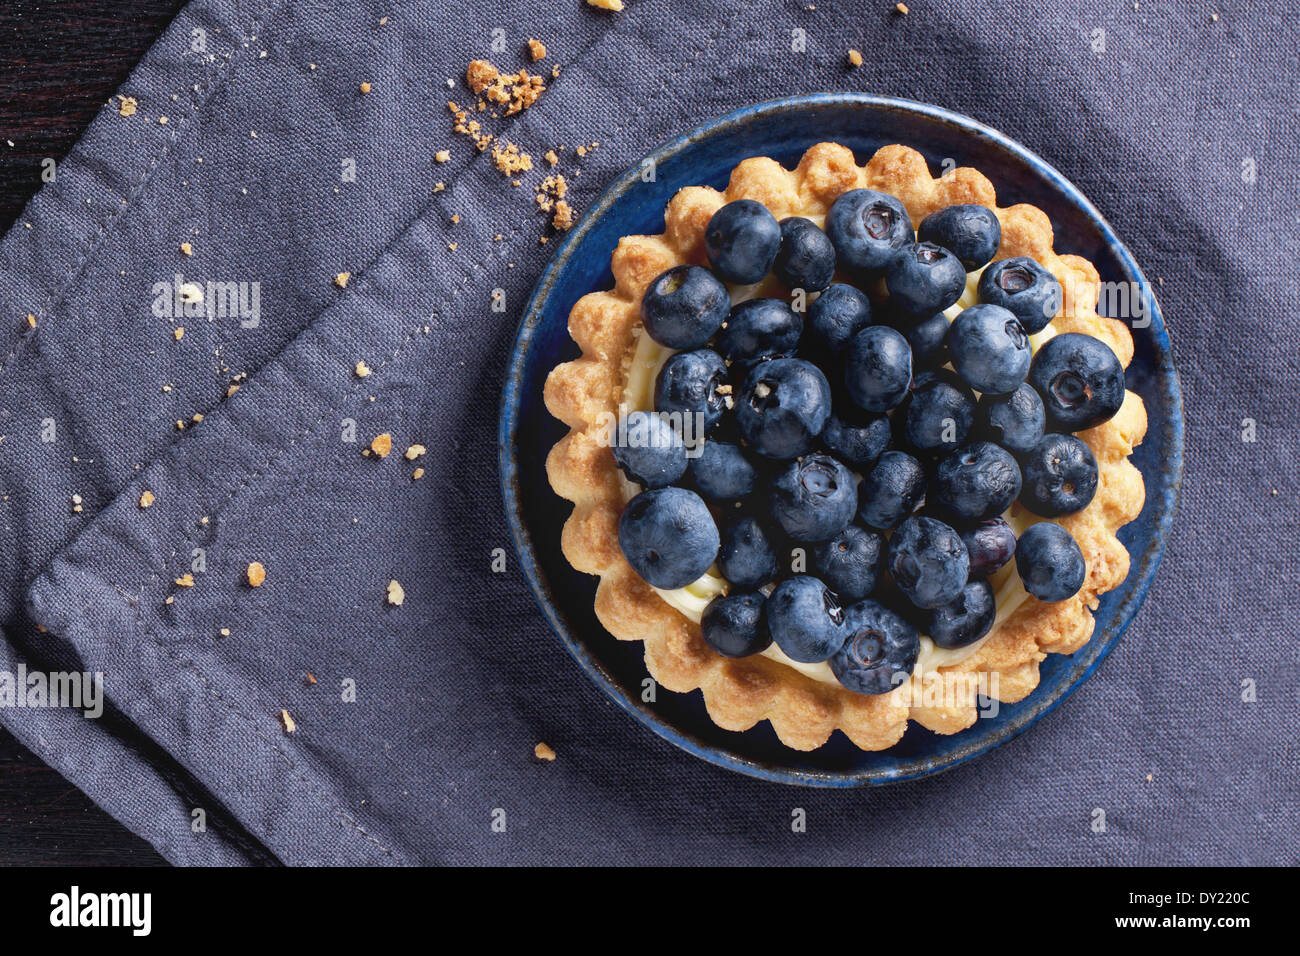 Vista superior de la tarta de arándanos servido sobre azul placa de cerámica sobre una servilleta de textiles. Imagen De Stock